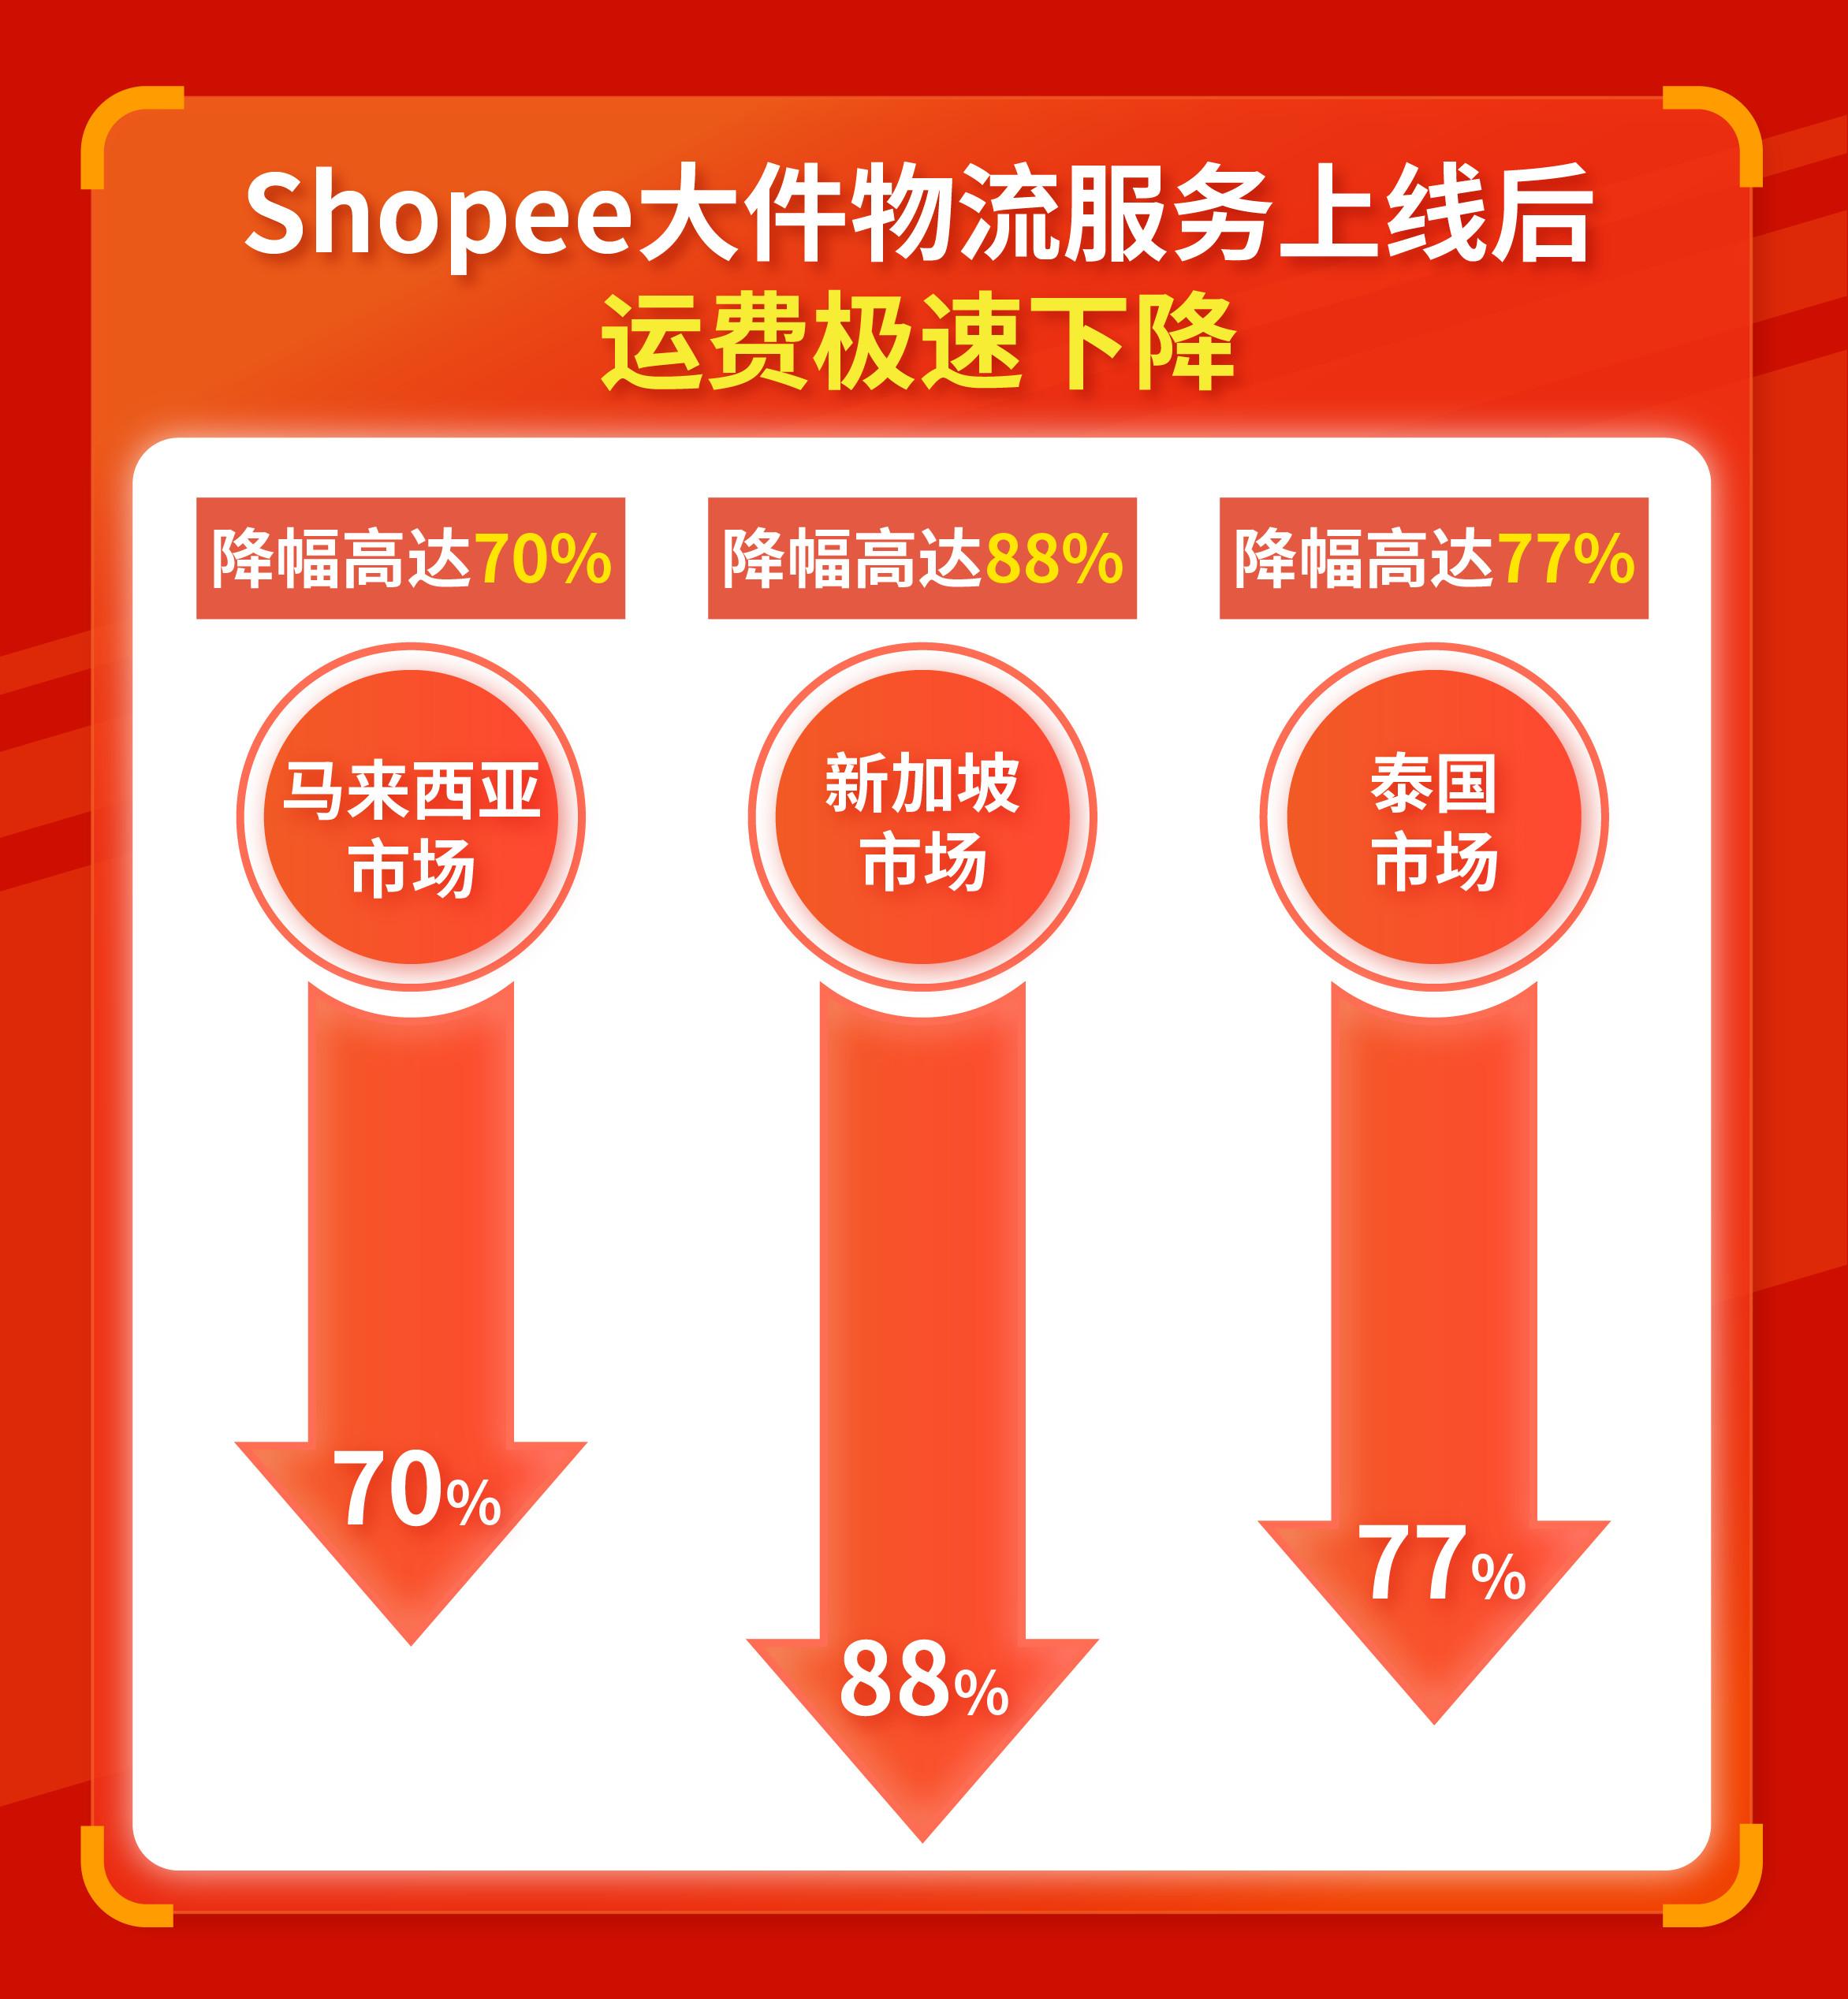 Shopee大件物流服务运费.jpg